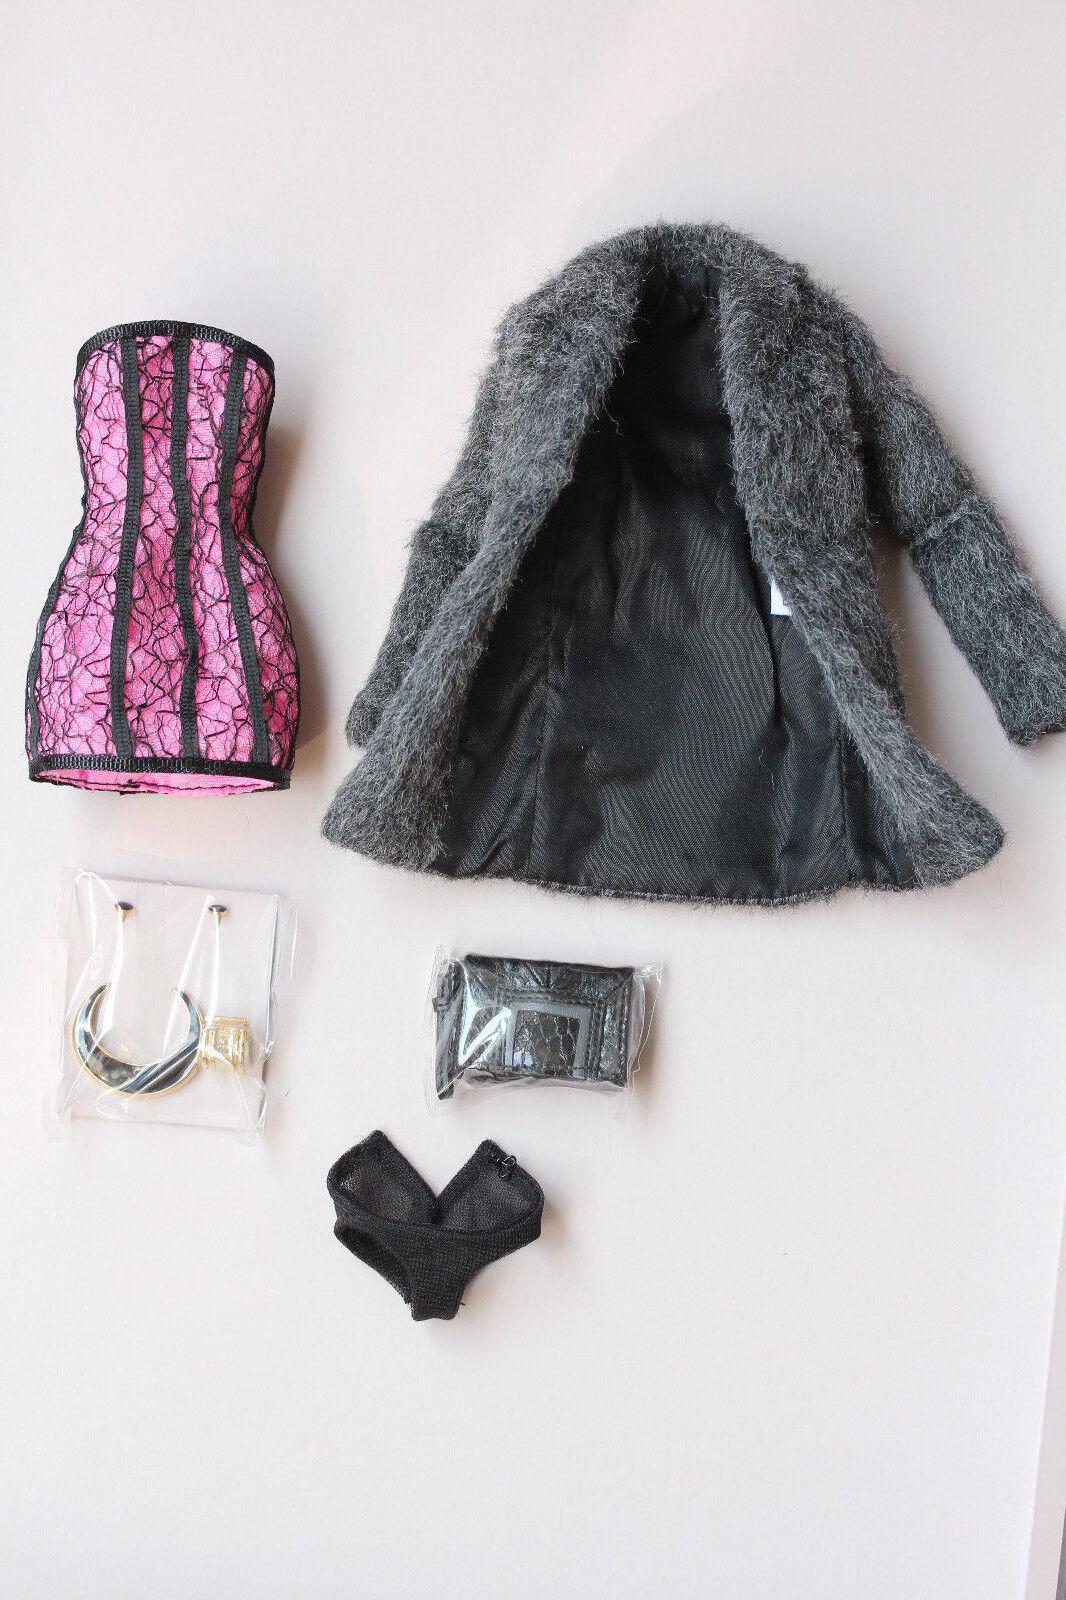 Tenue partielle Fashion Royalty NuFace Never Ordinary Eden W Club exclusive